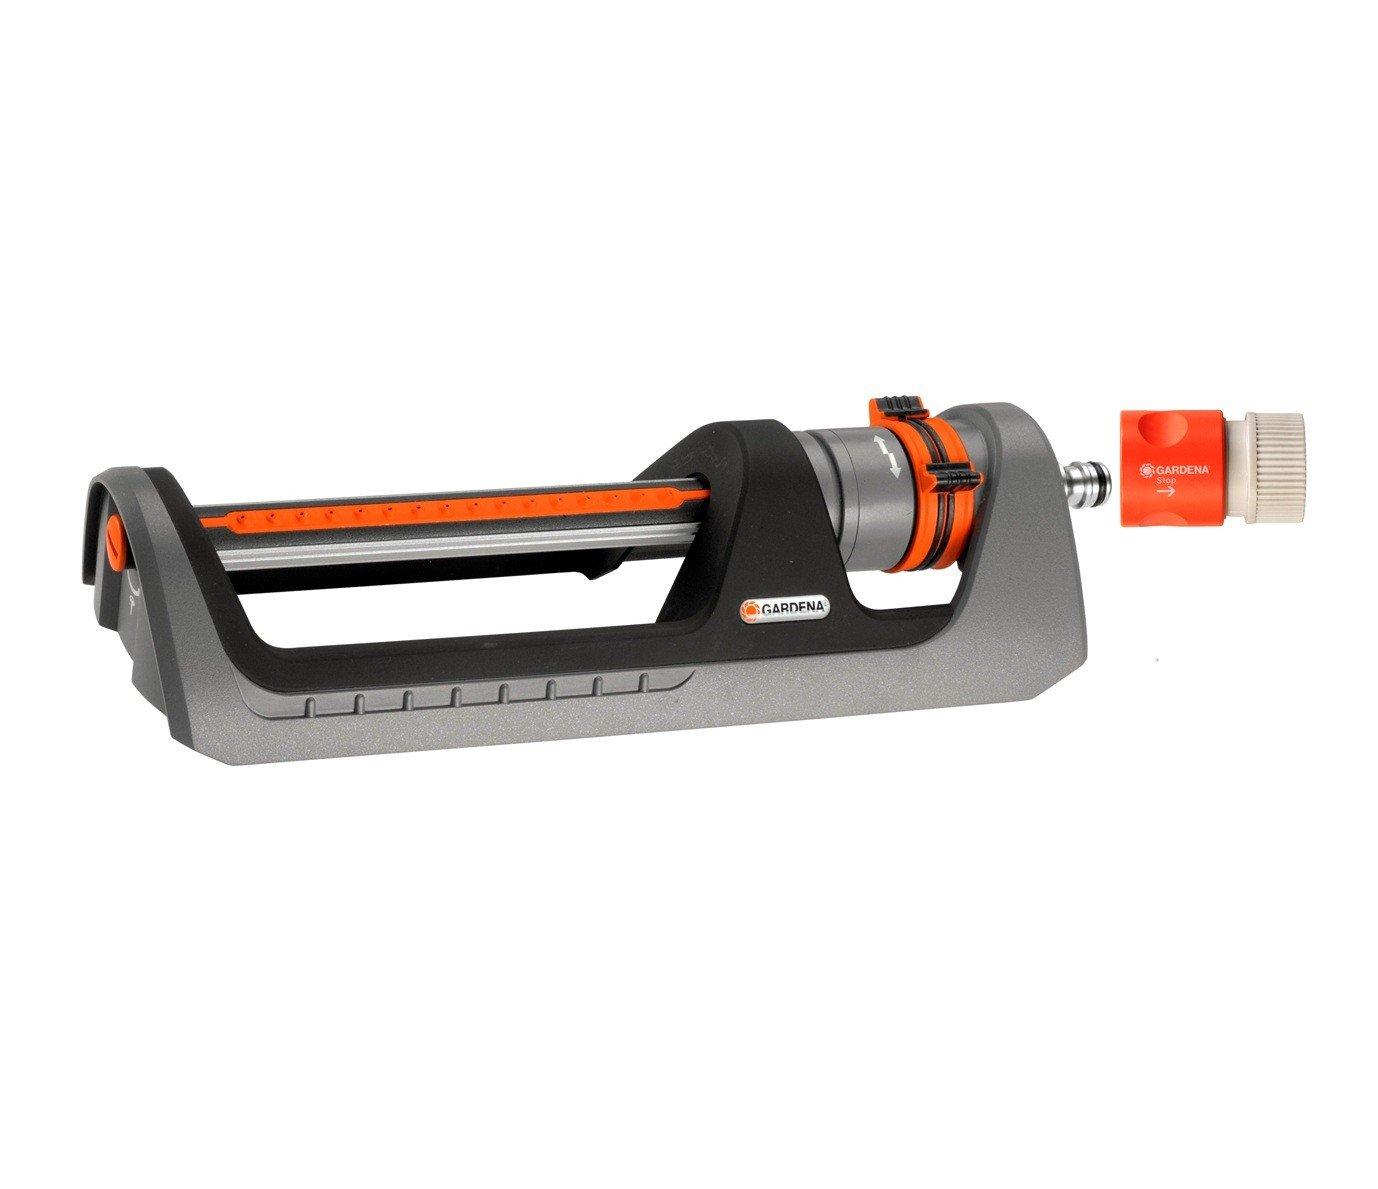 Gardena Premium 2 600 Square Foot Fully Adjustable Oscillating Sprinkler 8151